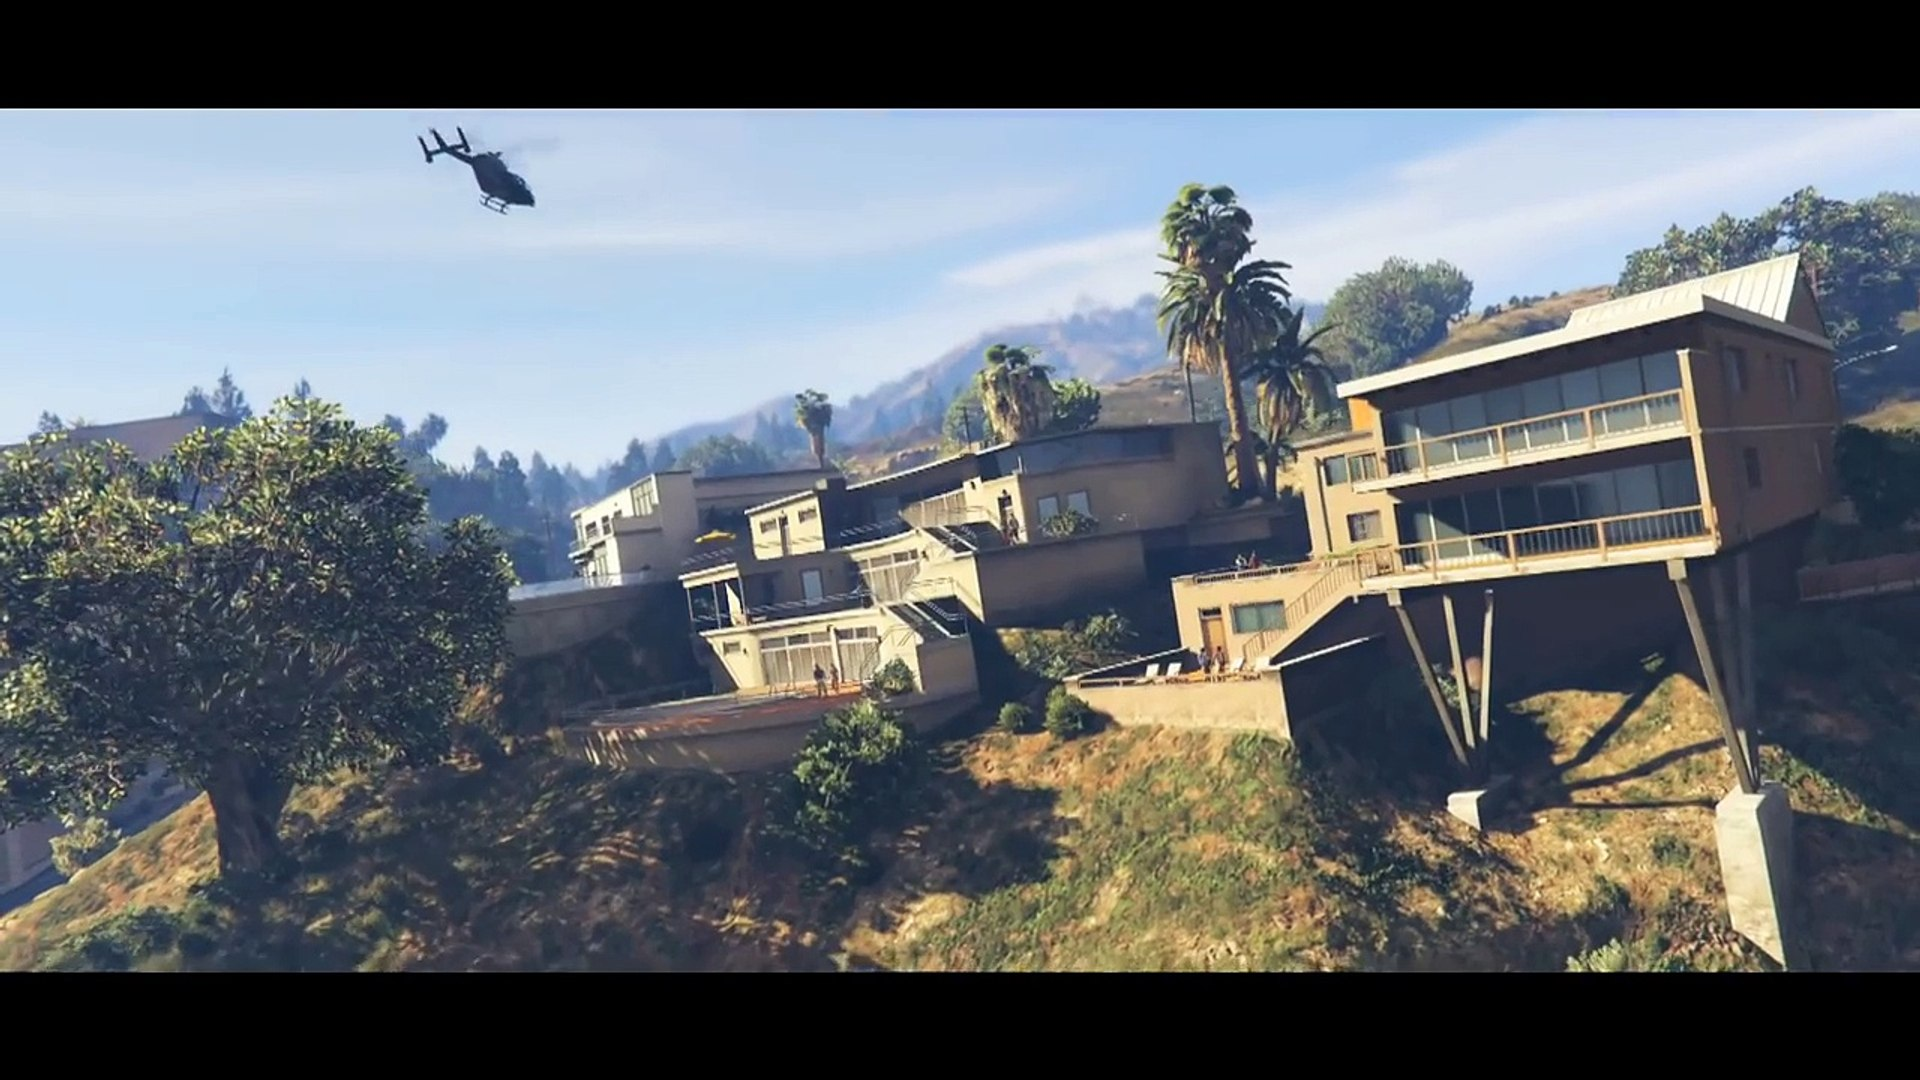 GTA 5 DLC Executives and Other Criminals: Yachts, Mansions, NEW Cars & Apartments (GTA 5 DLC)